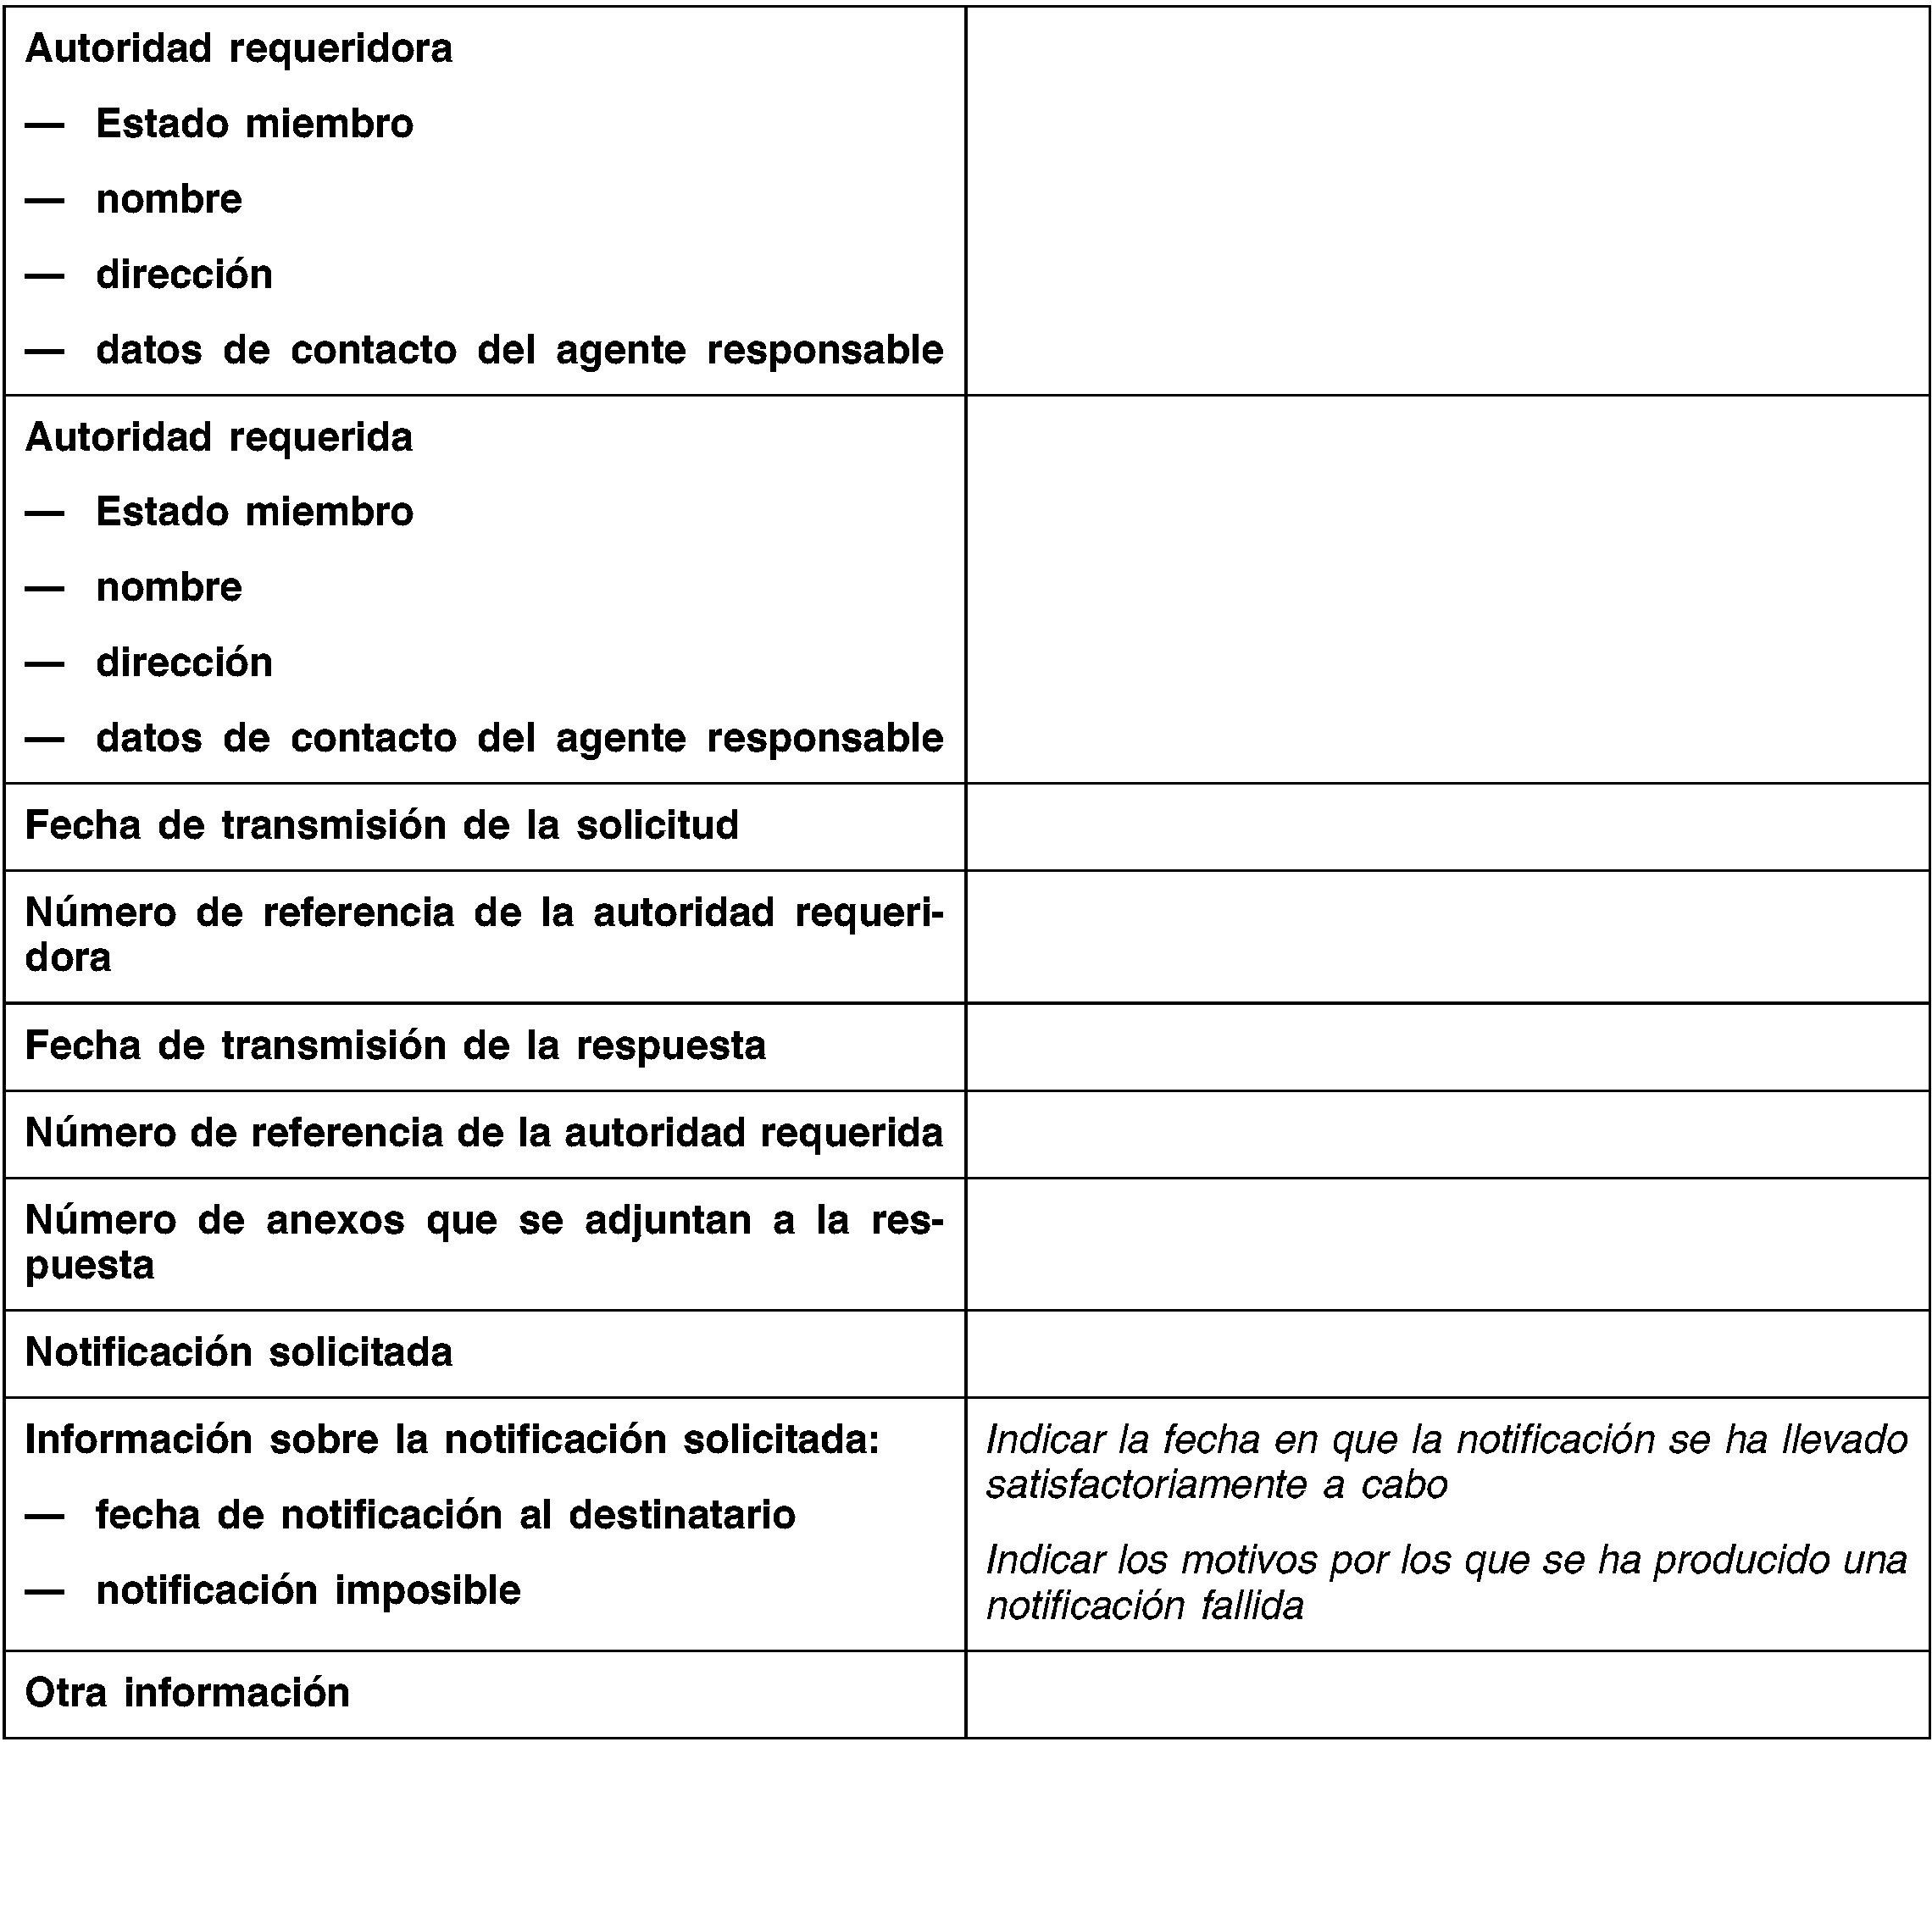 EUR-Lex - 02011R0404-20160101 - EN - EUR-Lex